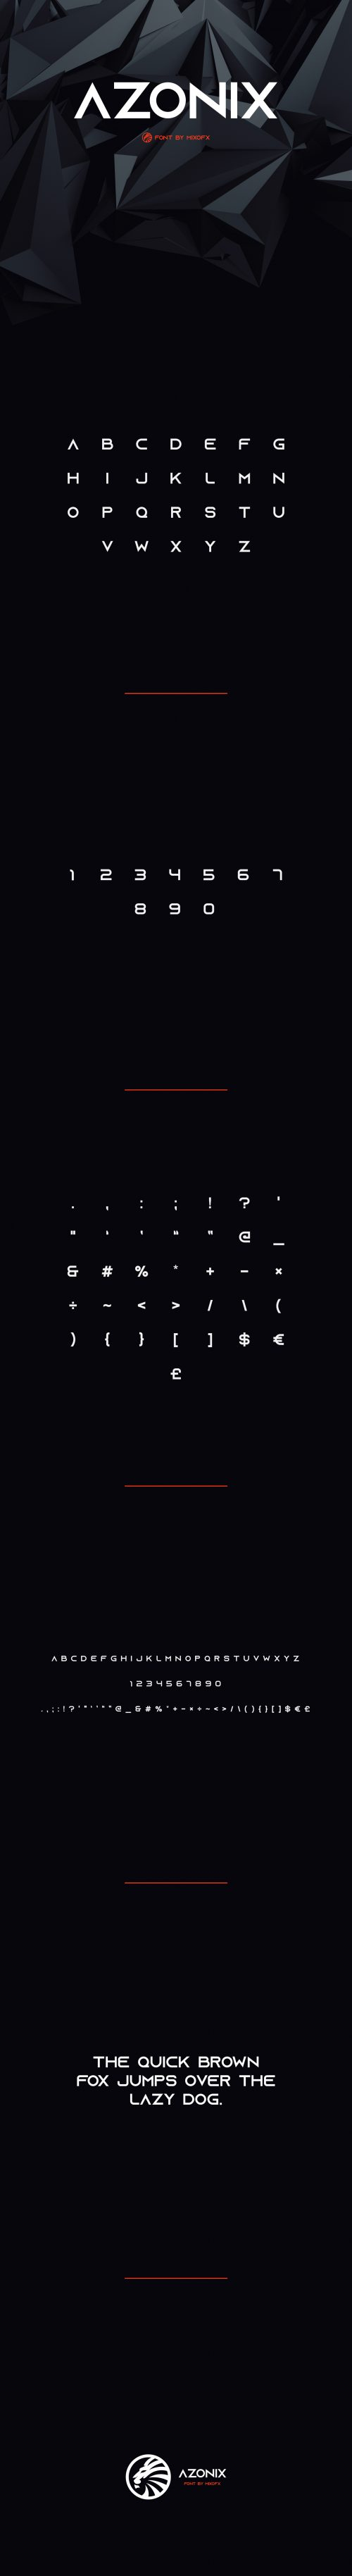 Asset | Azonix Free Modern Font Typeface